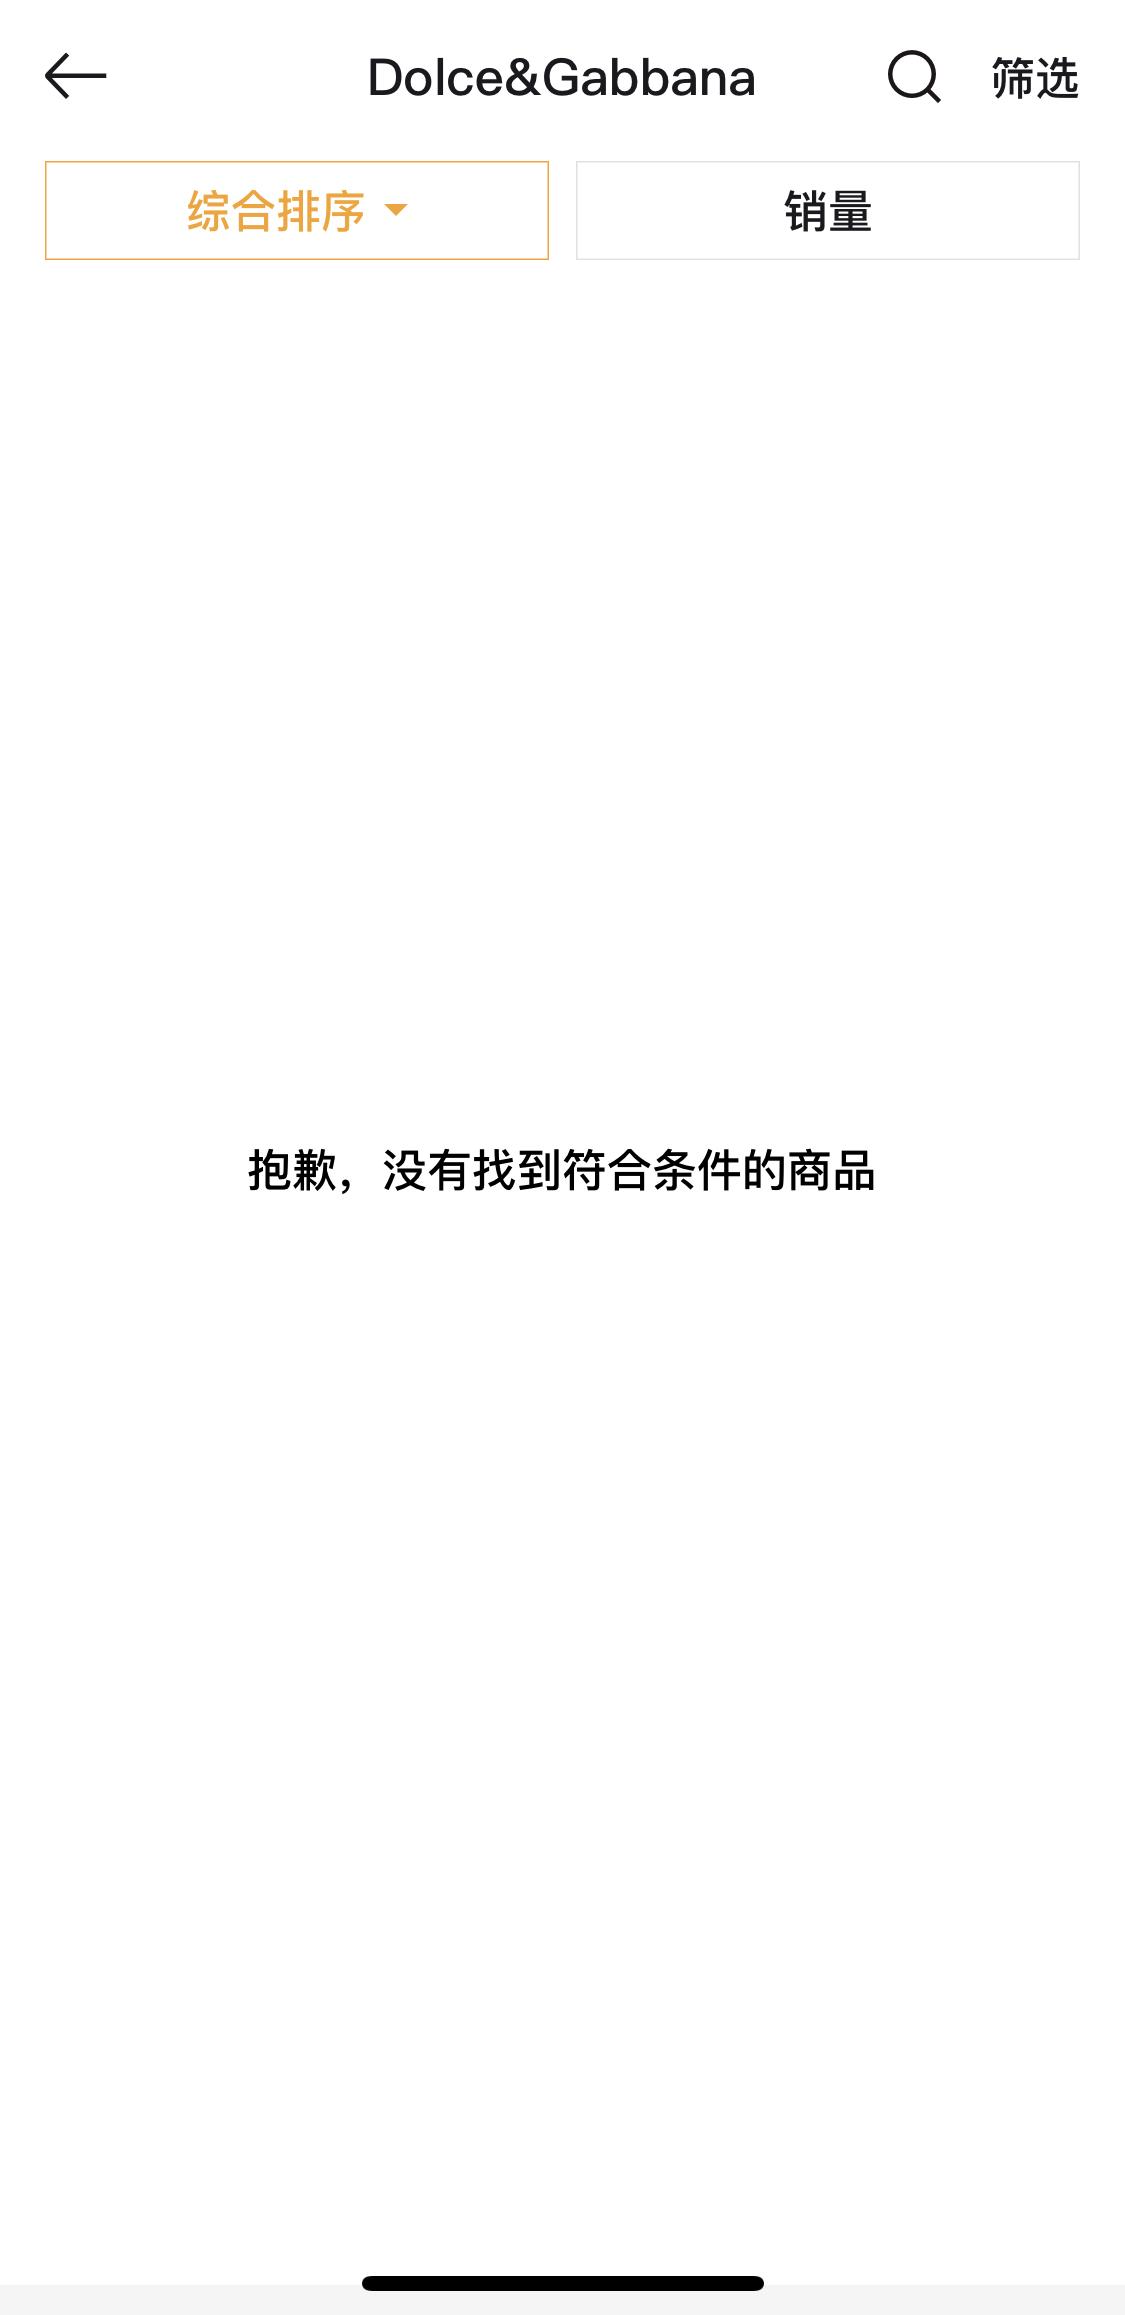 IMG_4419(20181121-234037).jpg